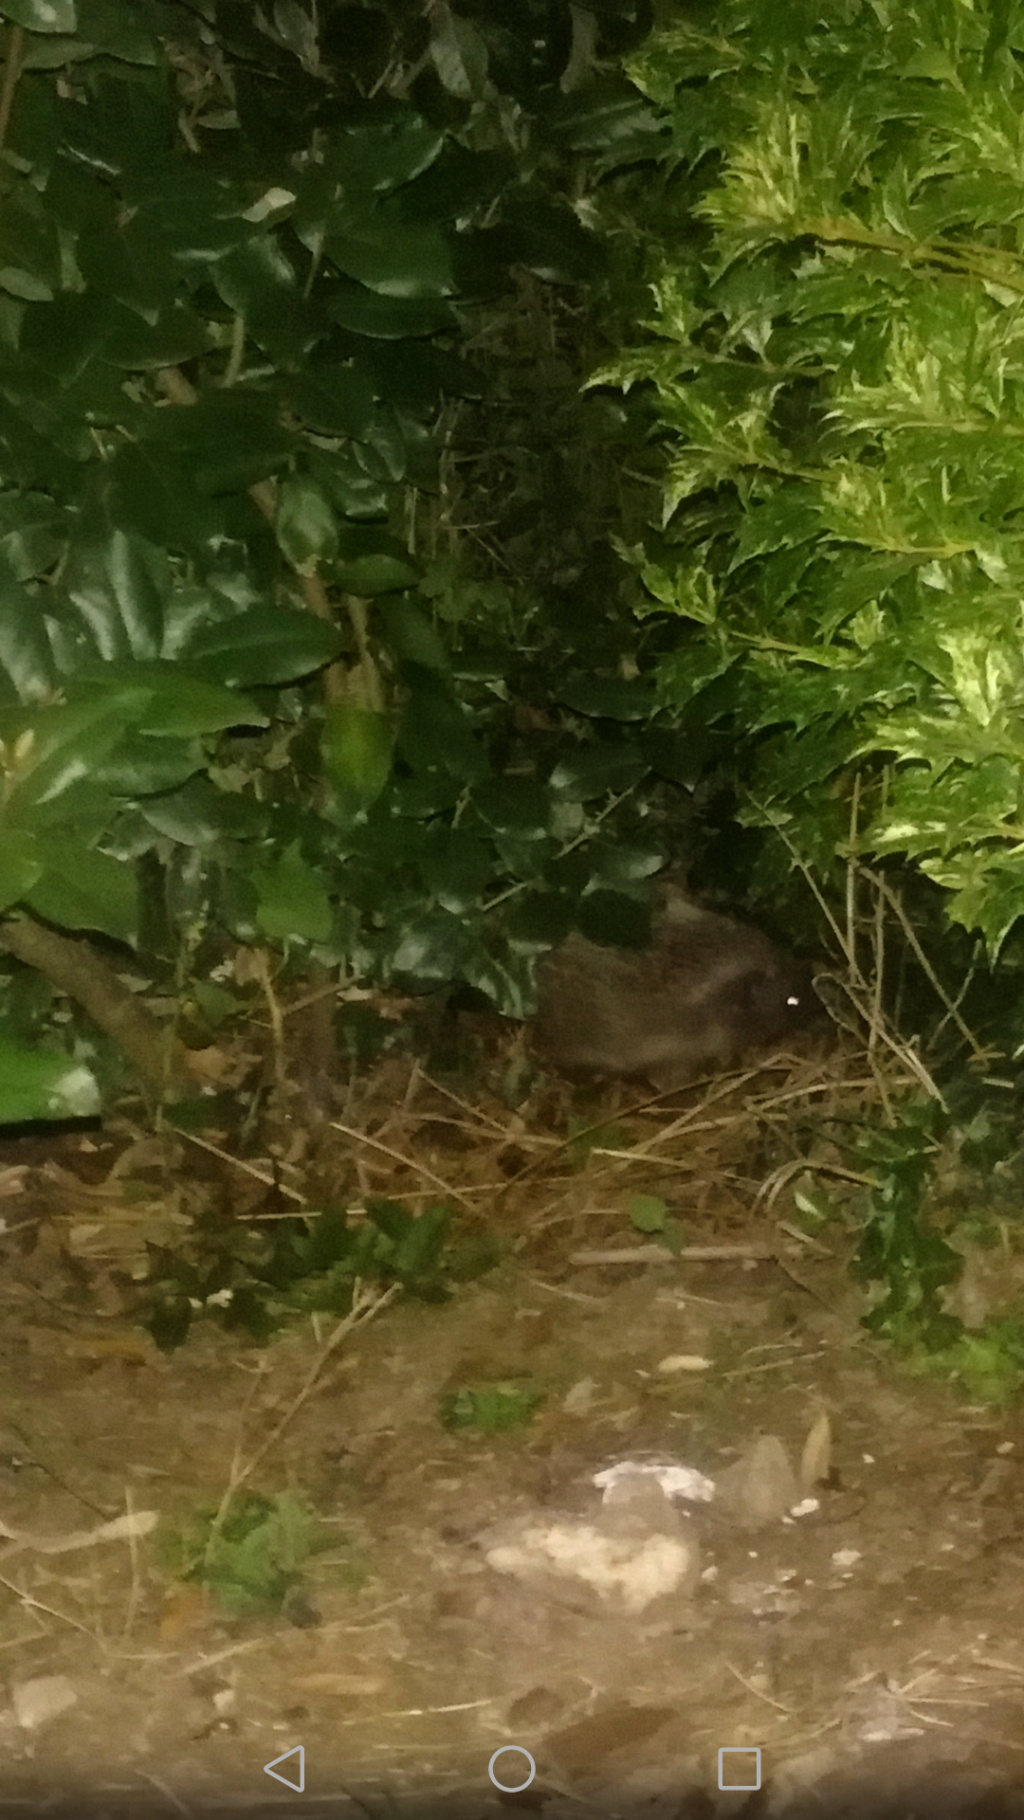 Clandestin dans mon jardin !! Screen13